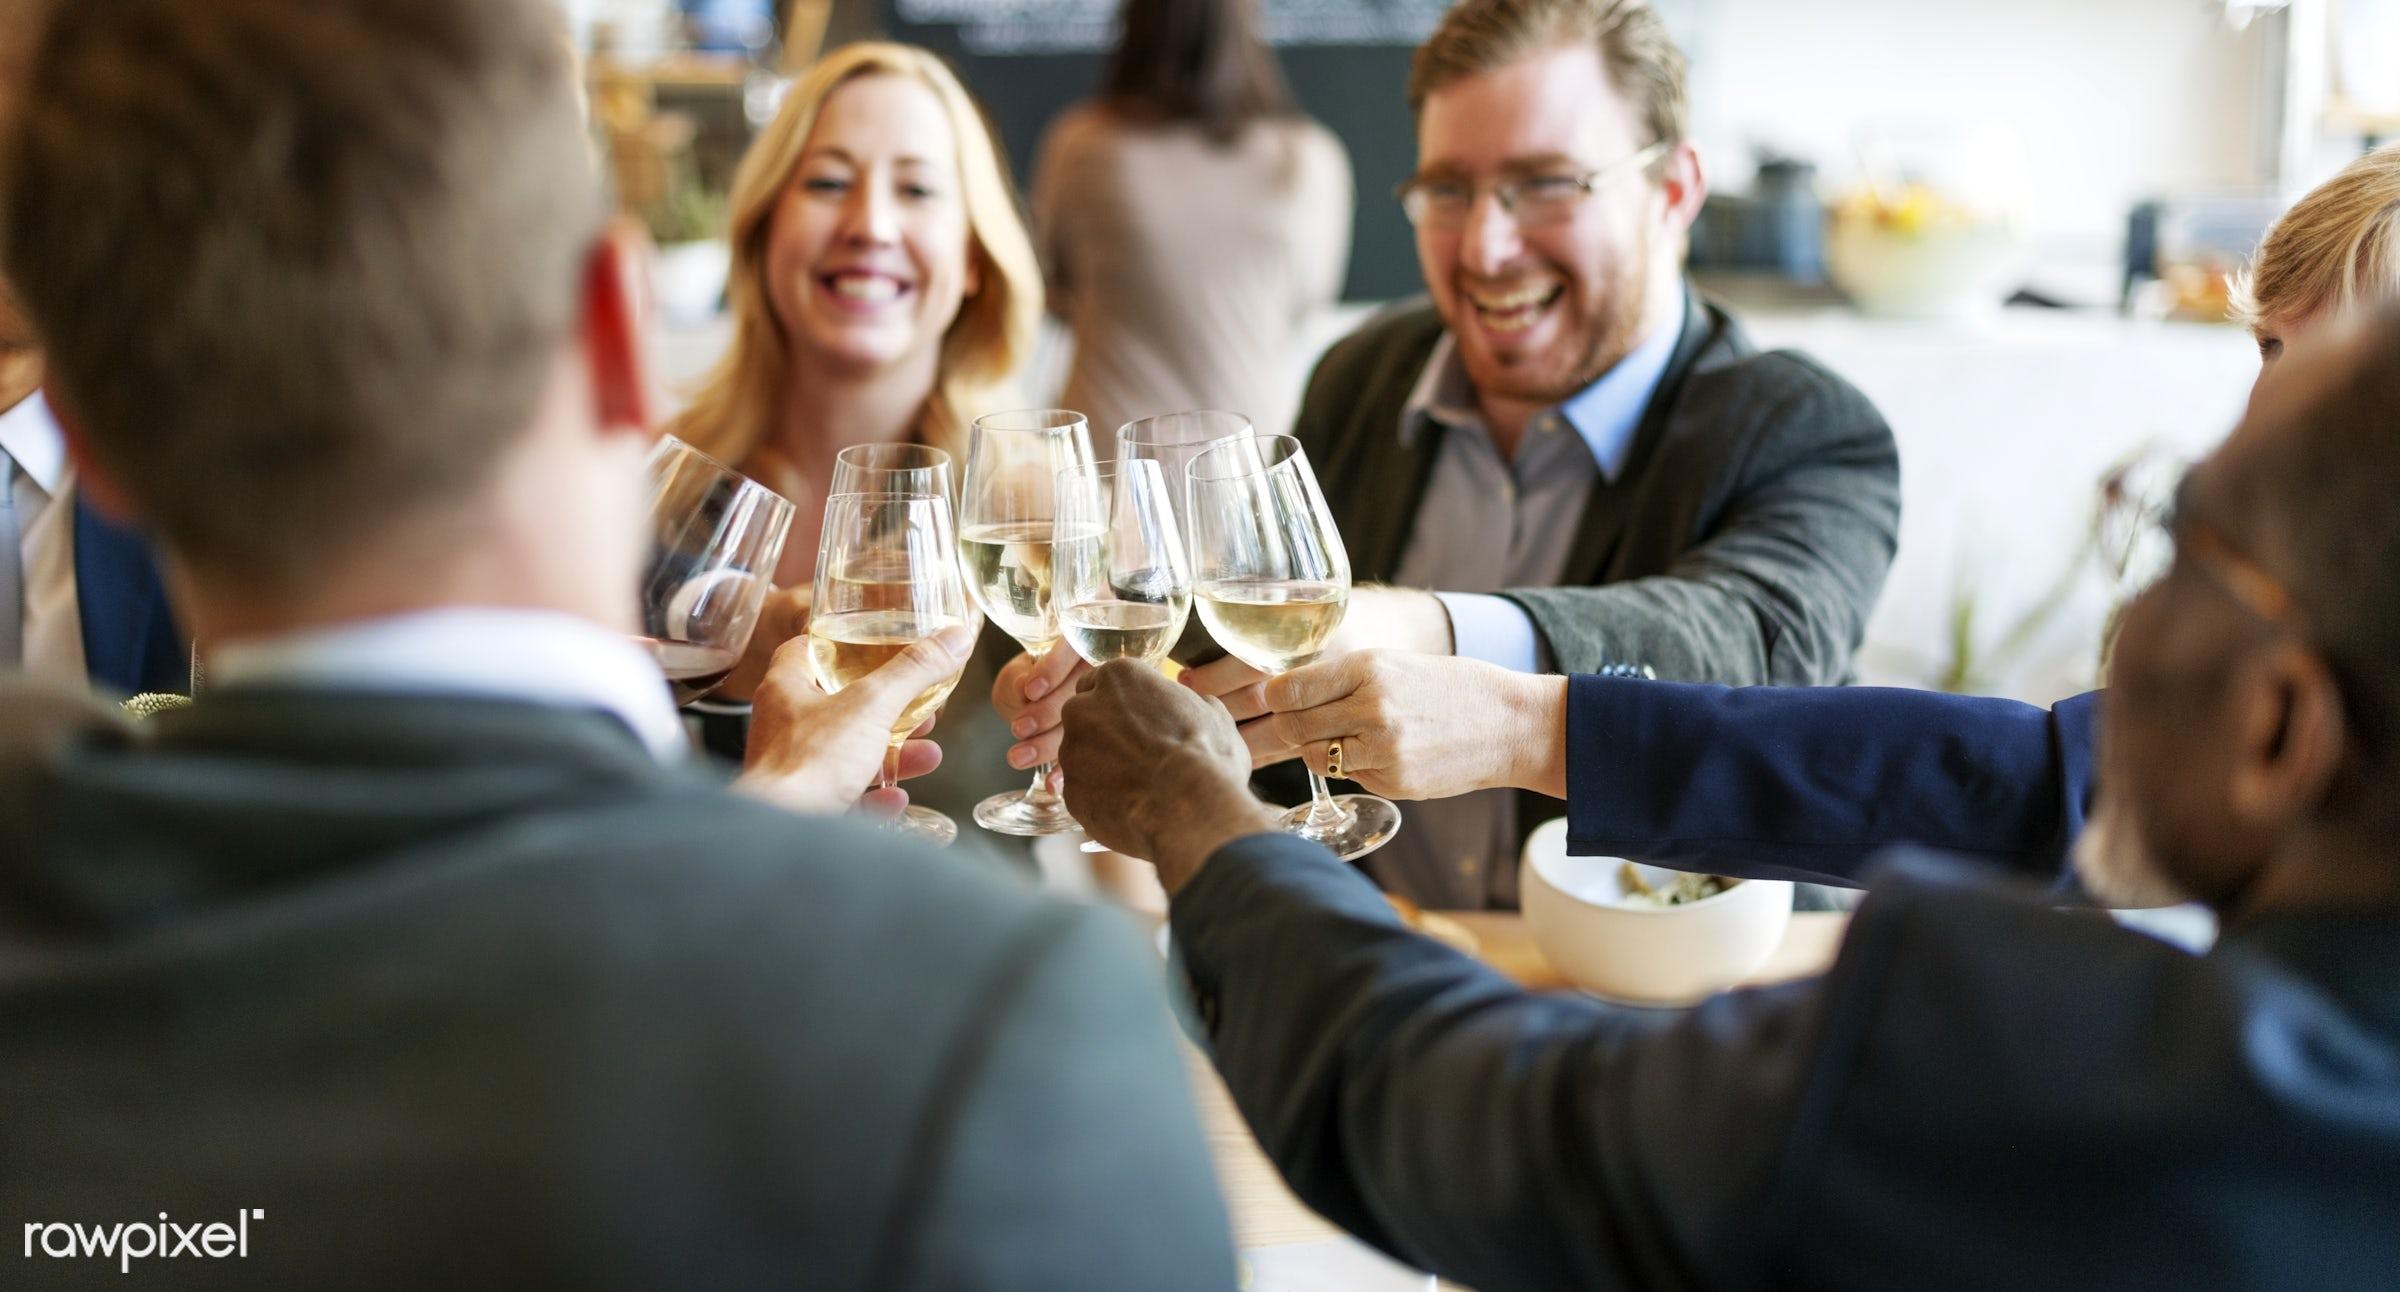 anniversary, beverage, business, business people, businessmen, businesswomen, cafe, celebrate, celebration, cheerful, cheers...